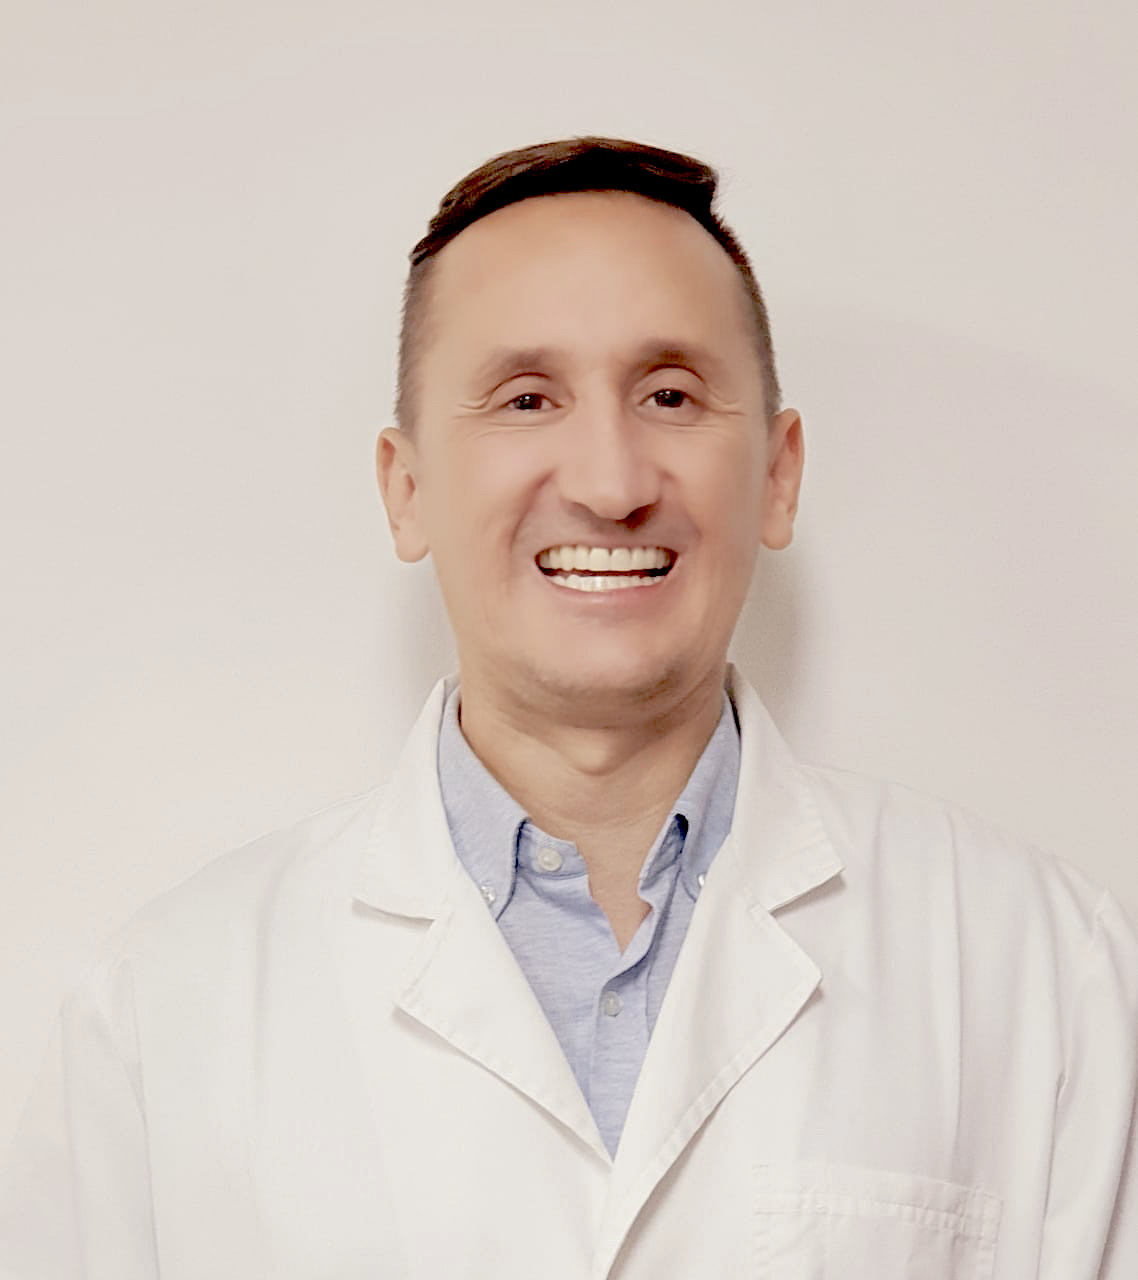 Dr. Juan David Velasquez